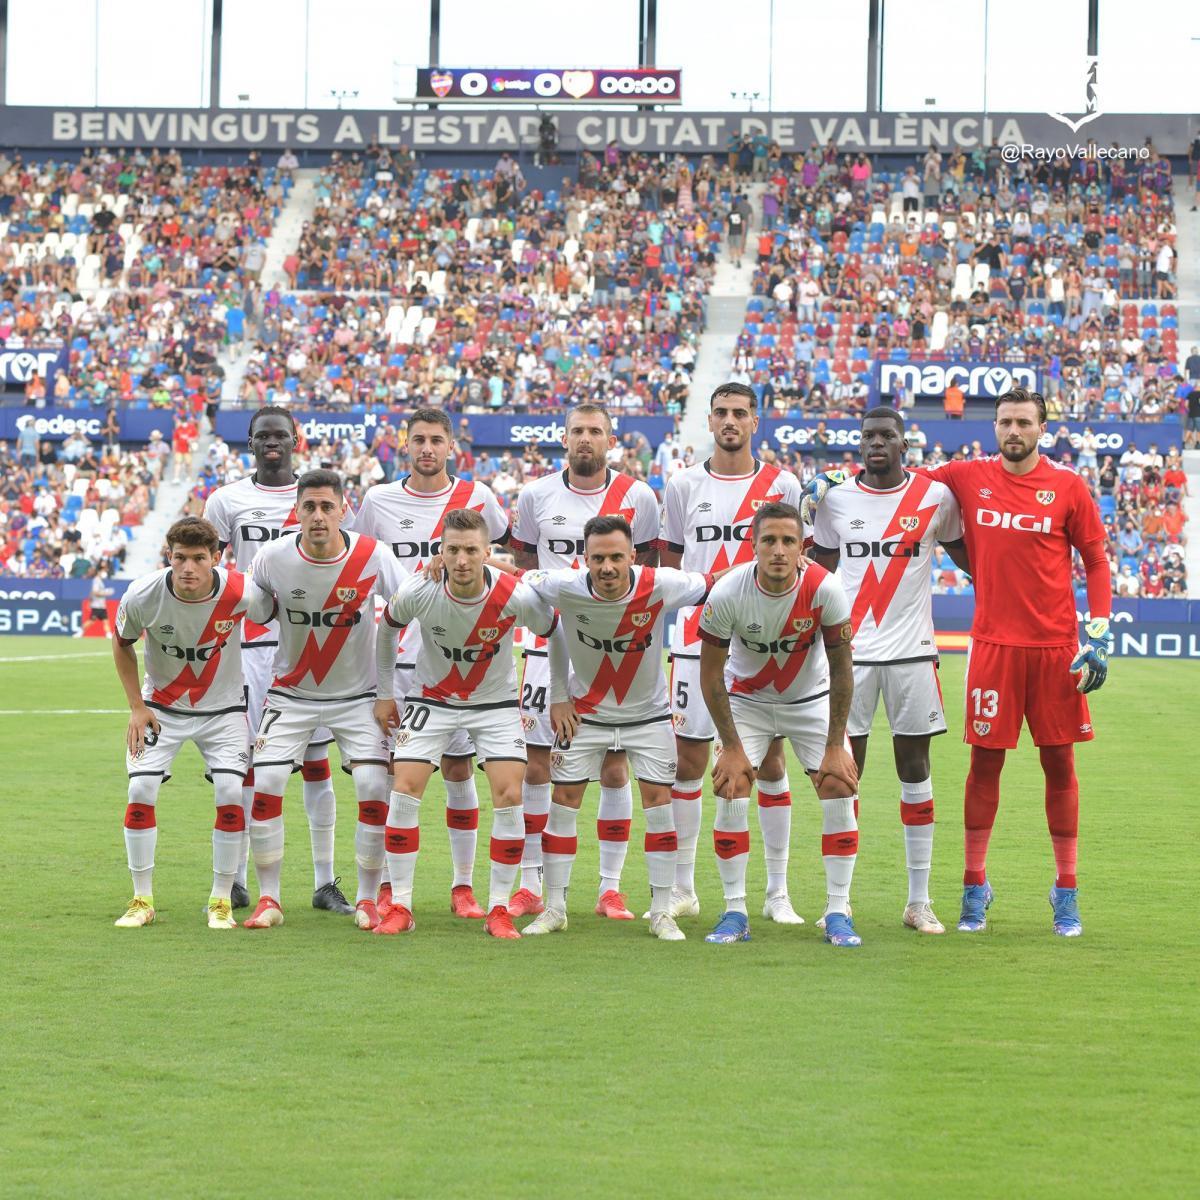 Twitter: Rayo Vallecano oficial